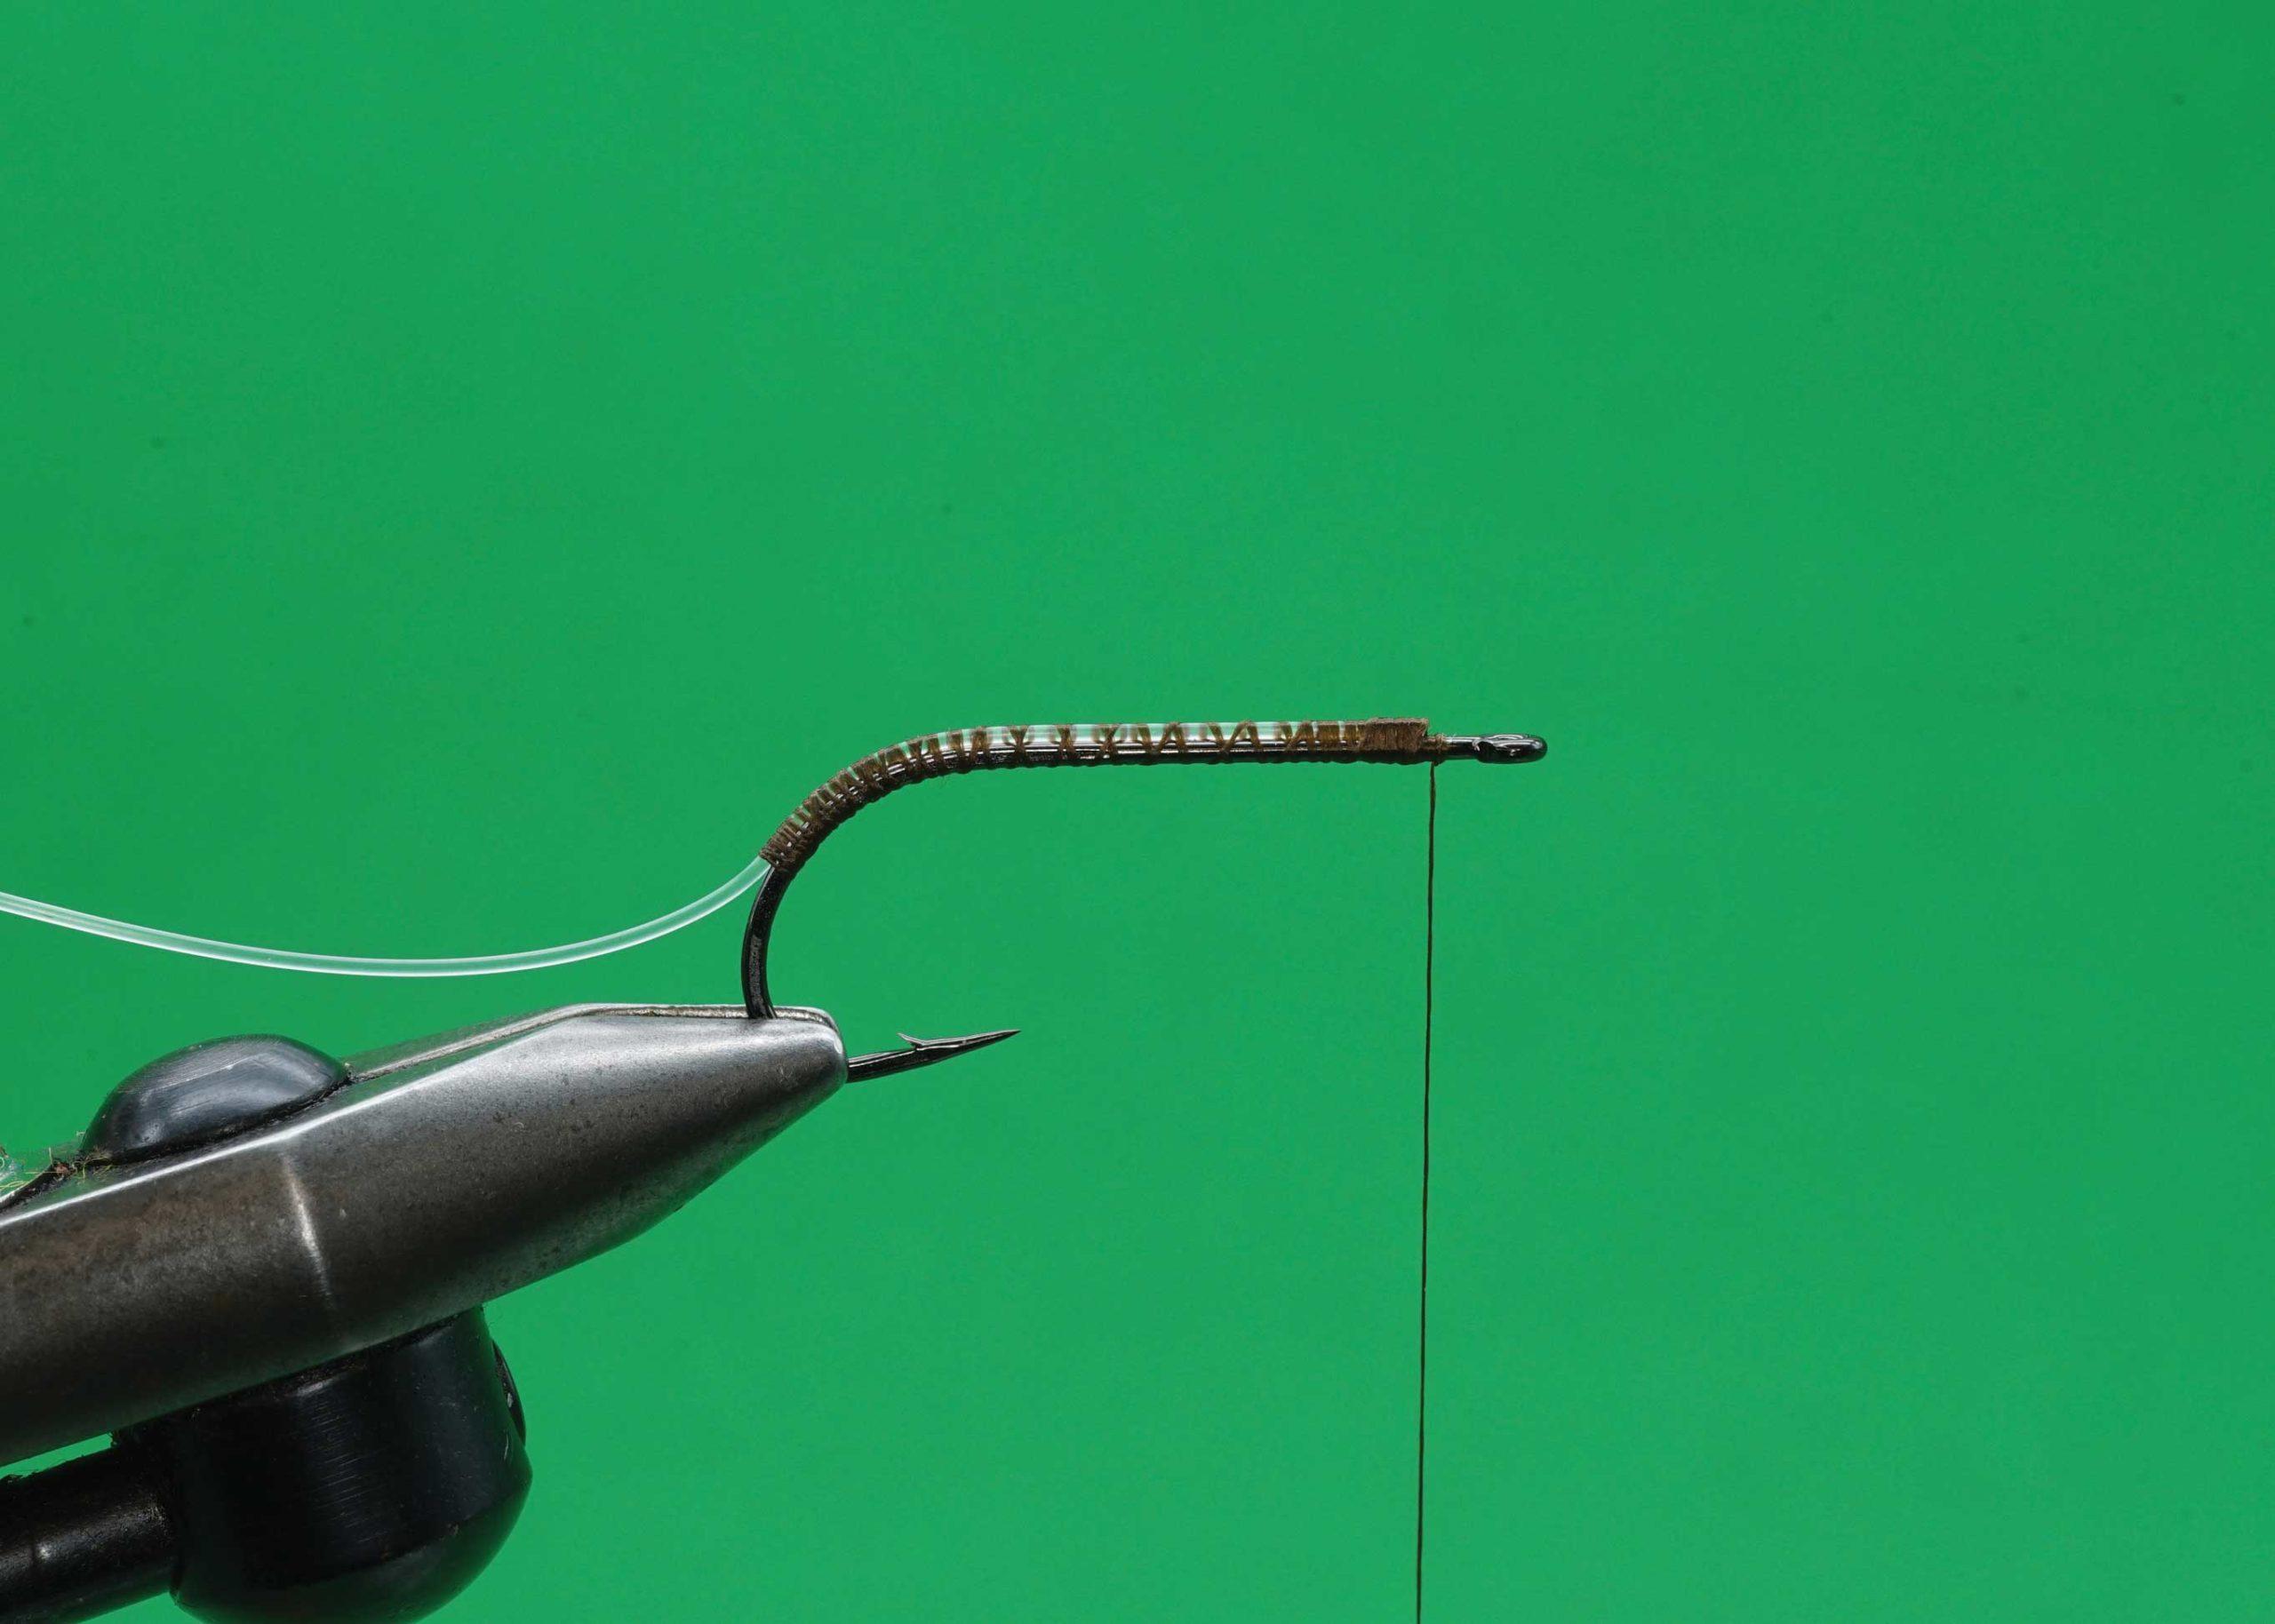 Predator Worm: Step 1.